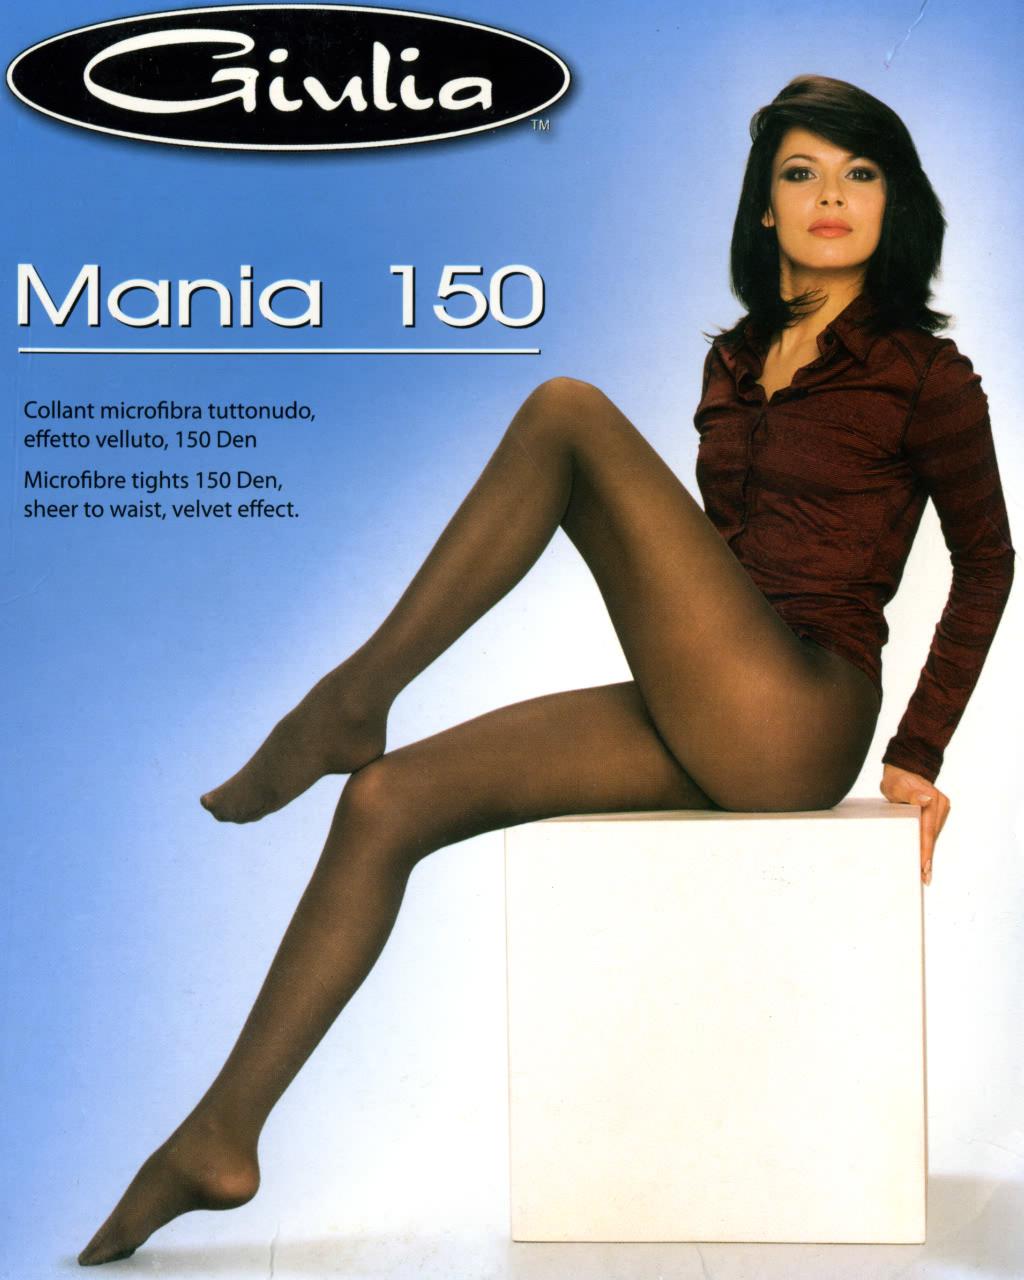 Giulia Mania 150.jpg